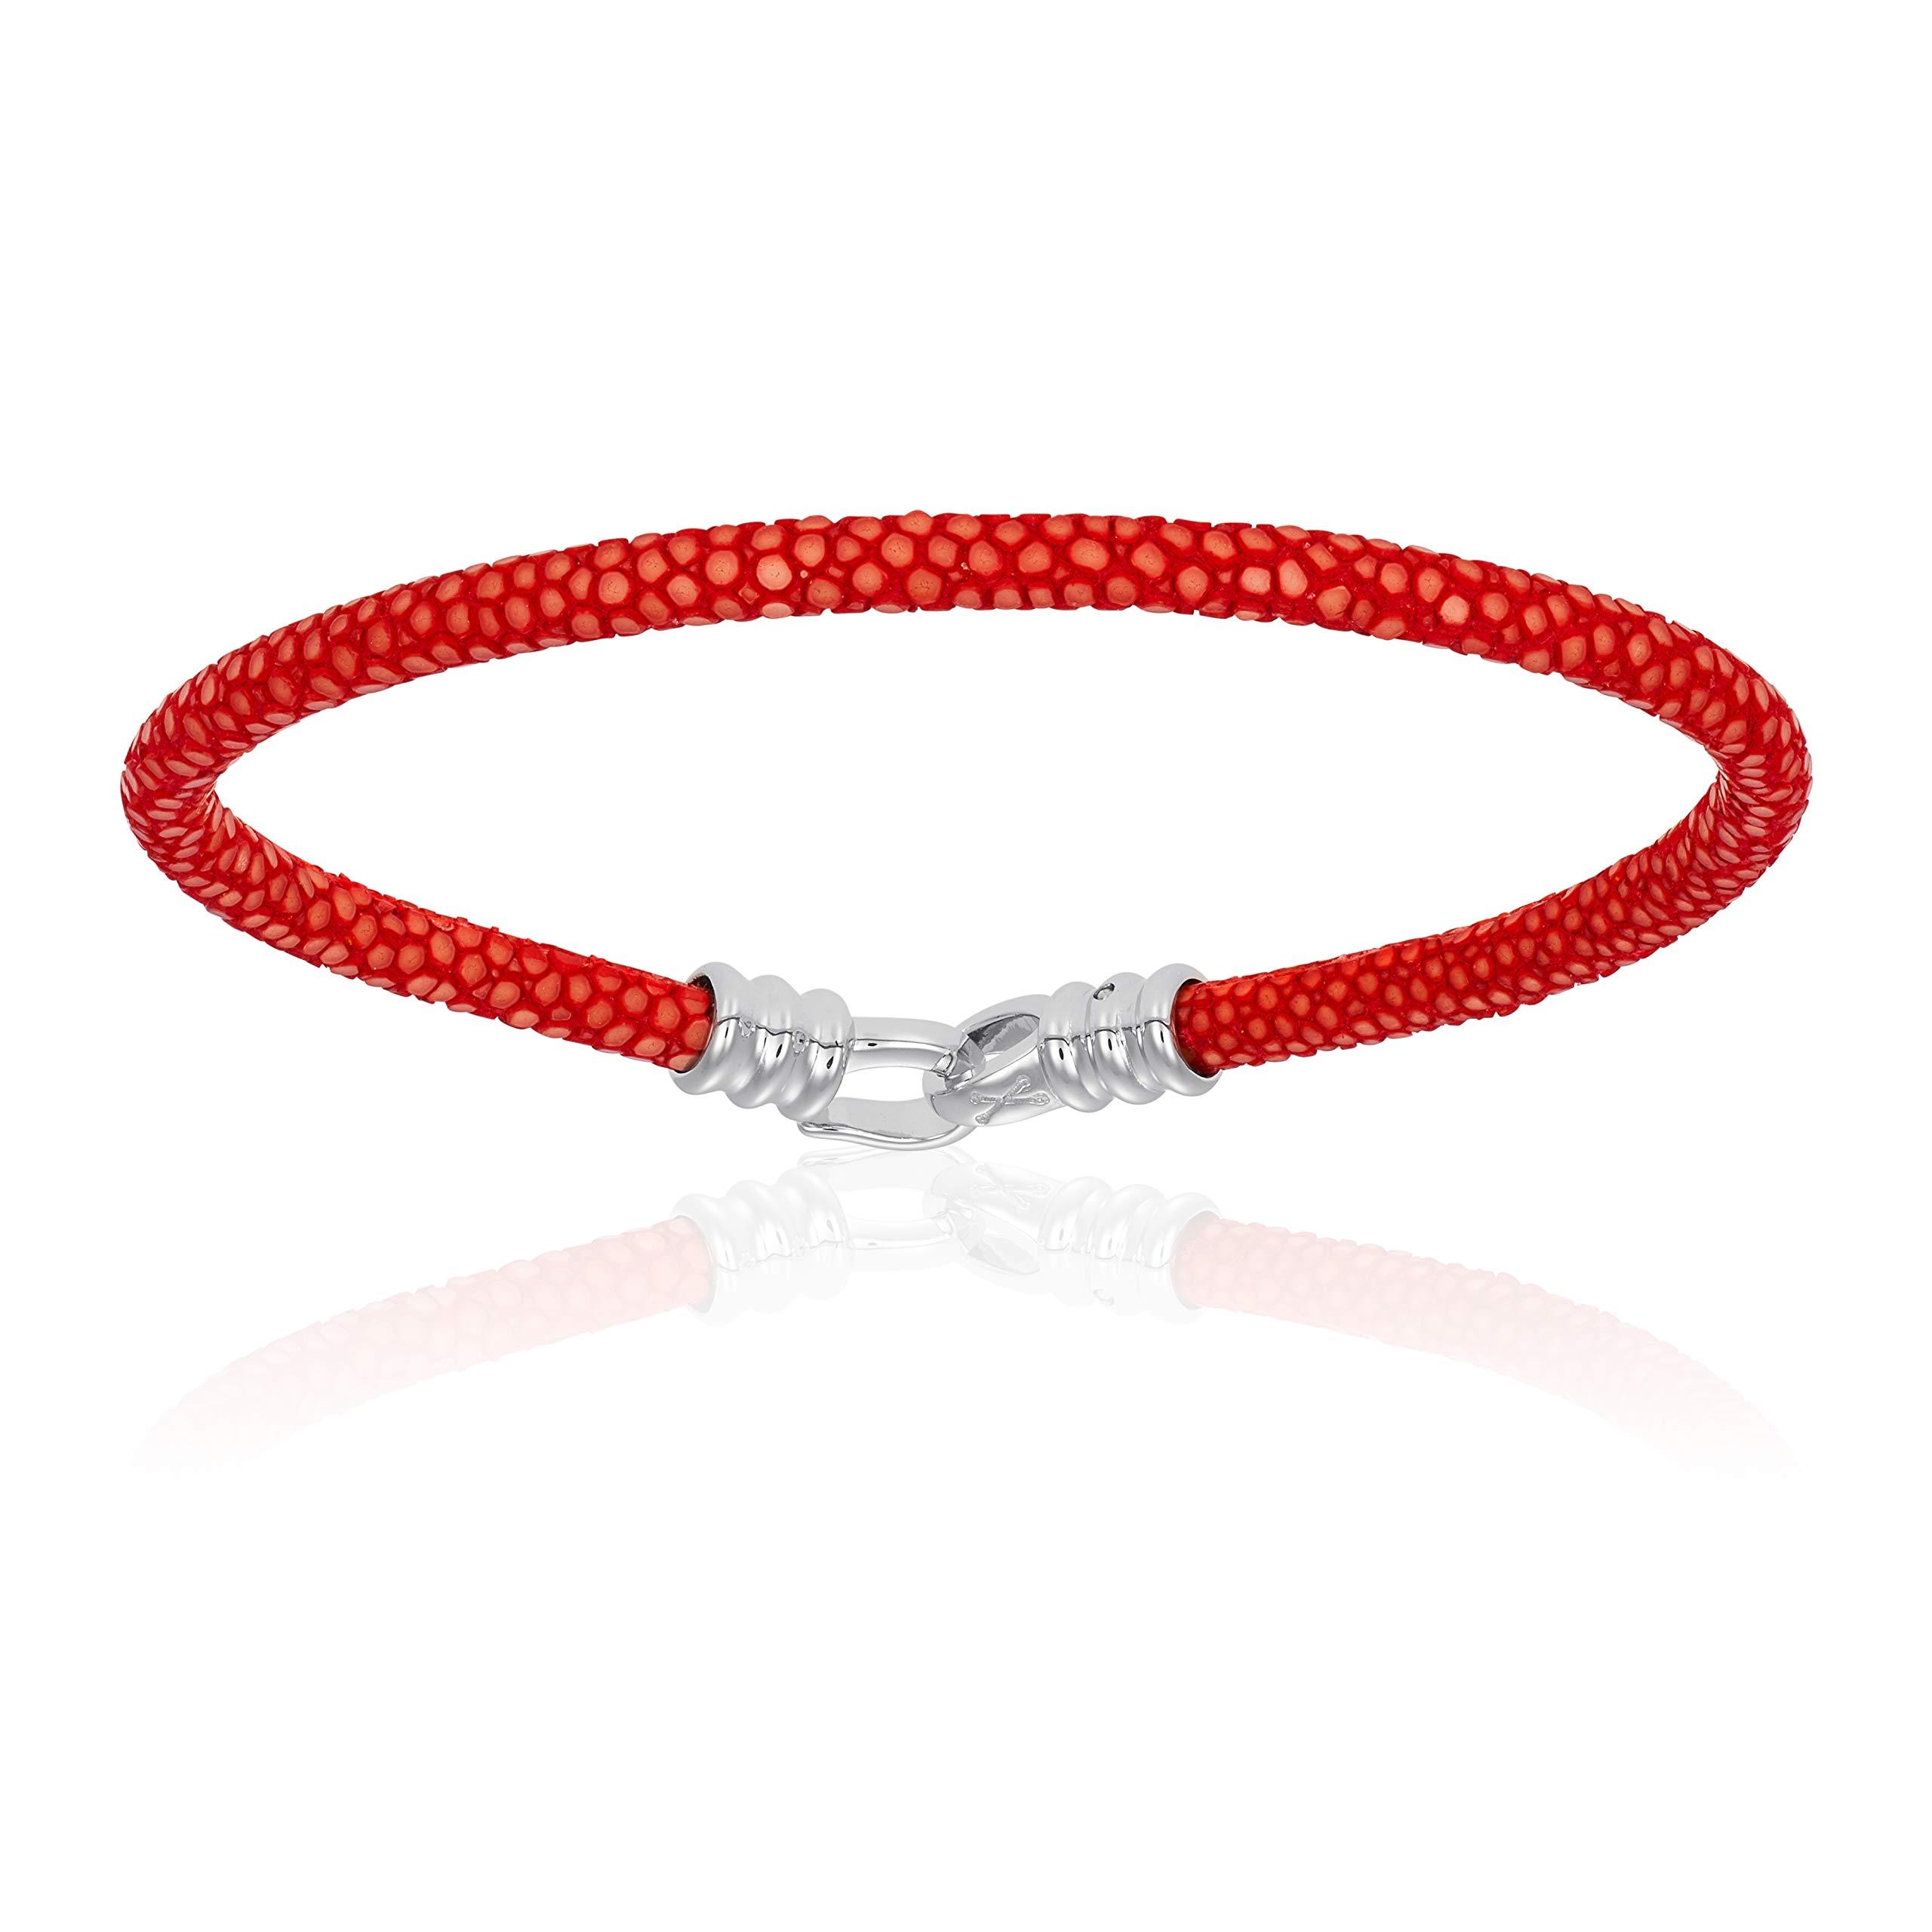 Double Bone Single Stingray Leather Bracelet (Red, 20)